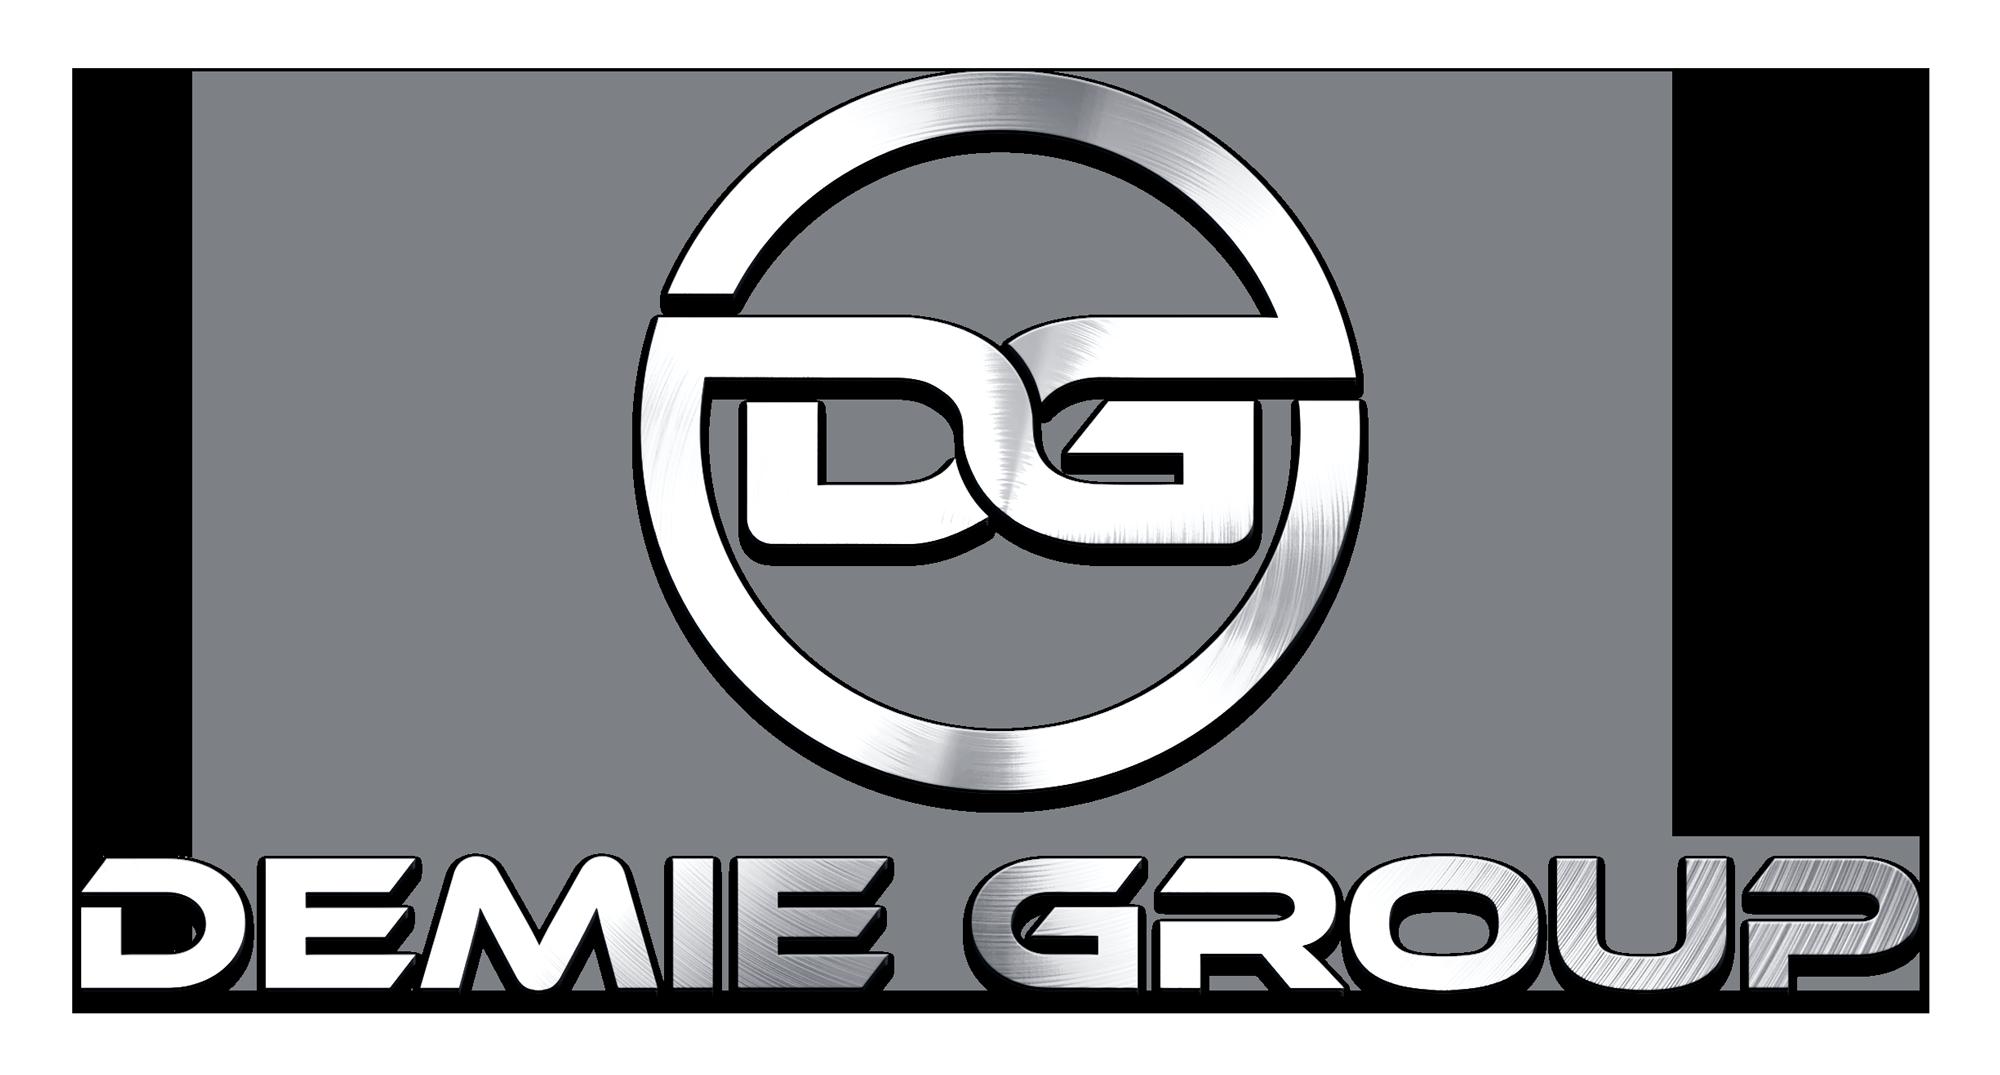 Demie Group